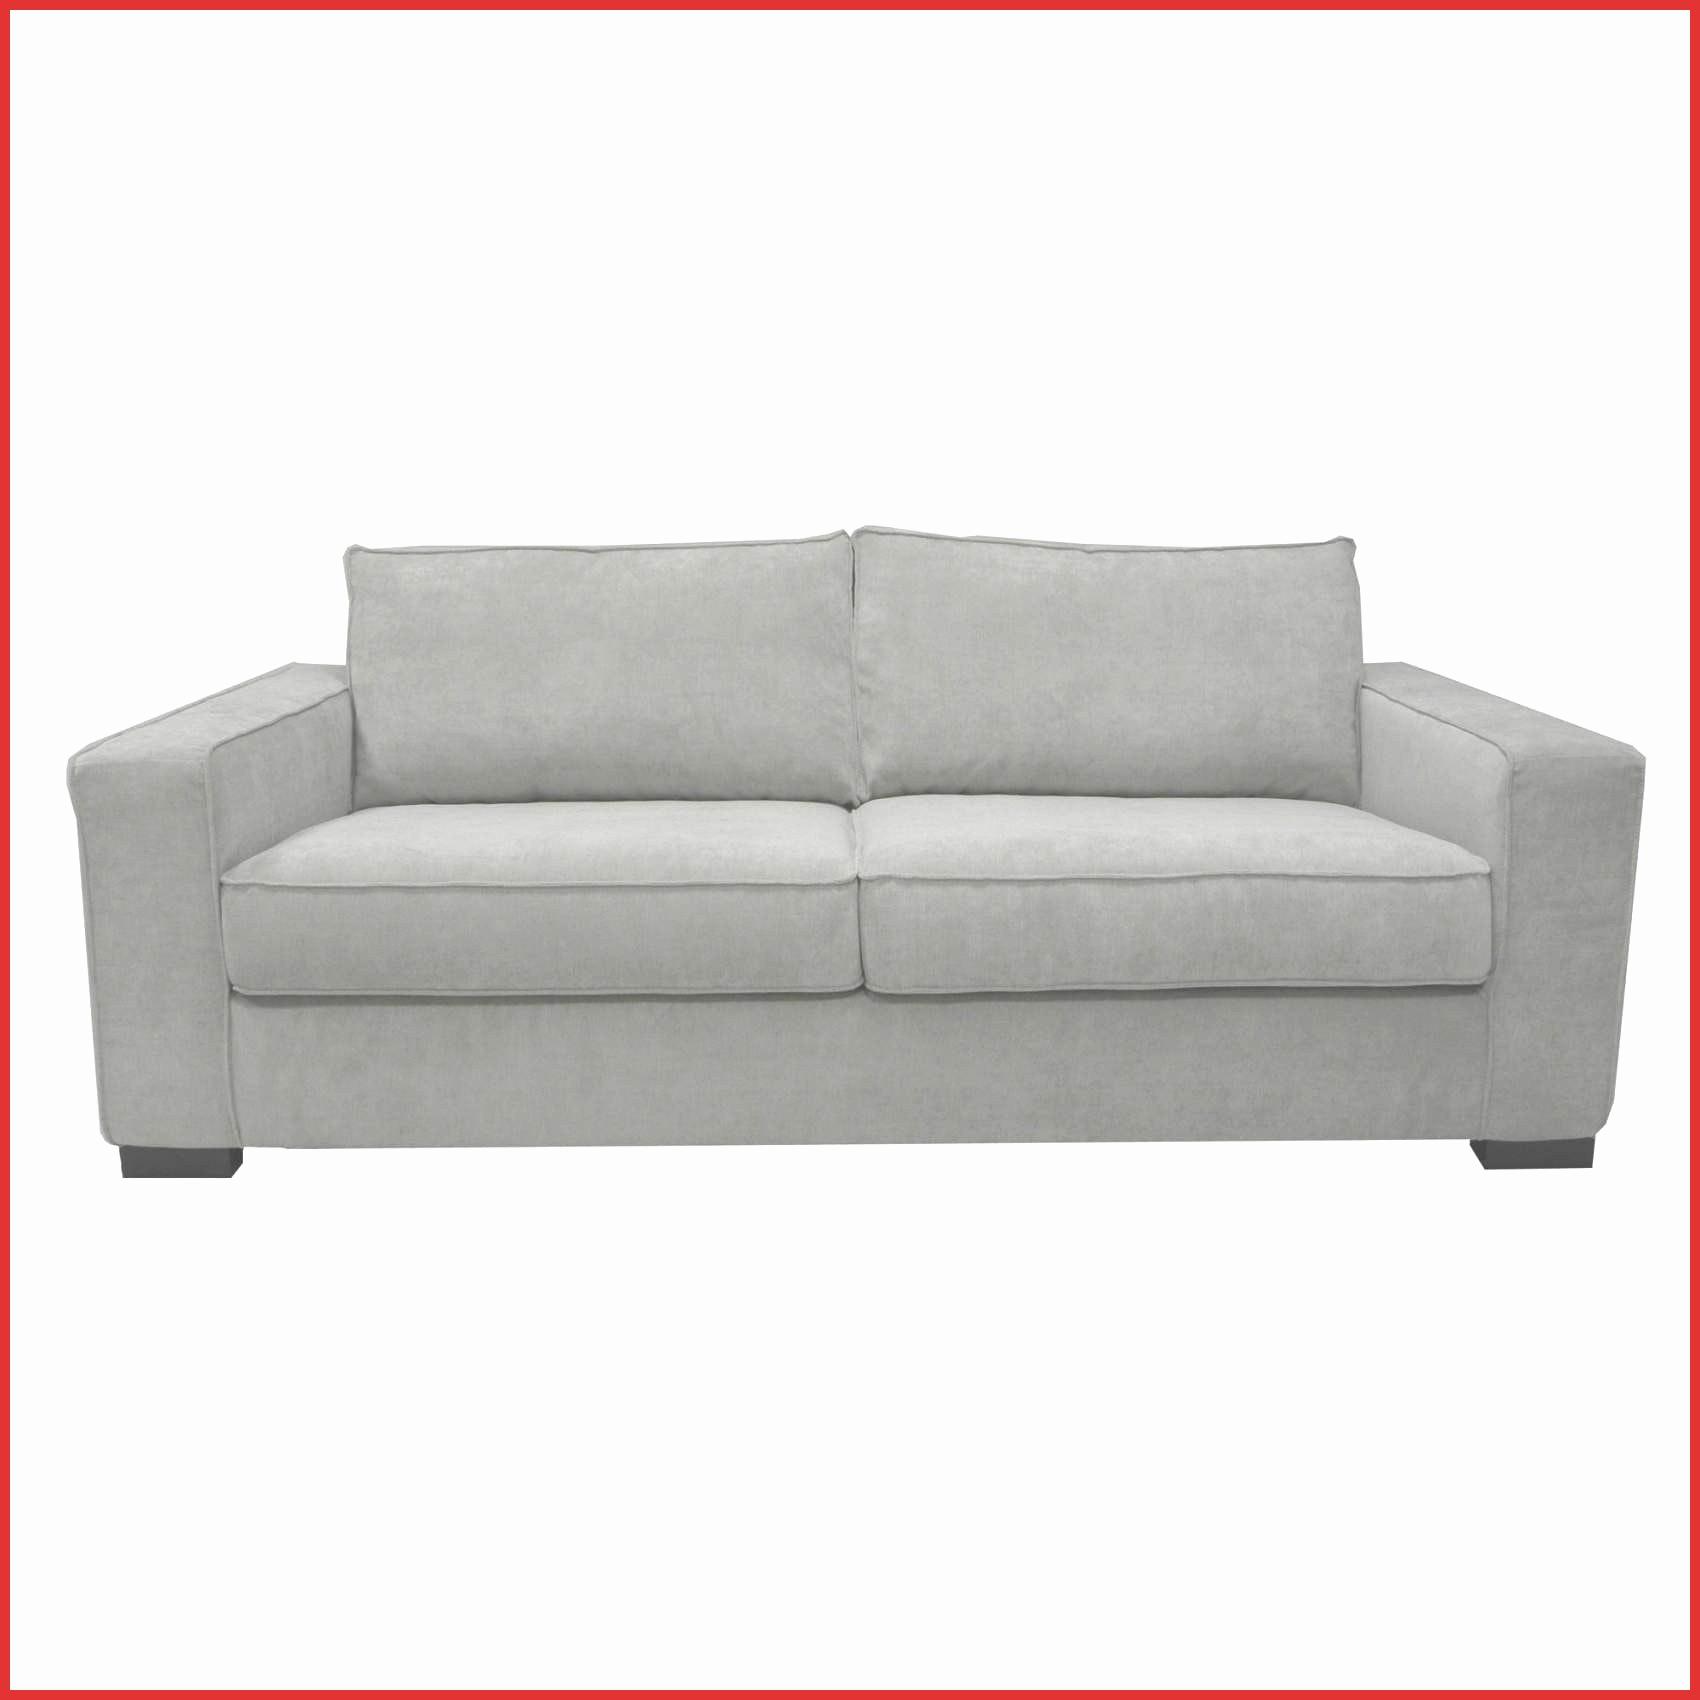 Canapé Convertible Pas Cher but Luxe Images Canap Convertible 3 Places Conforama 11 Lit 2 Pas Cher Ikea but